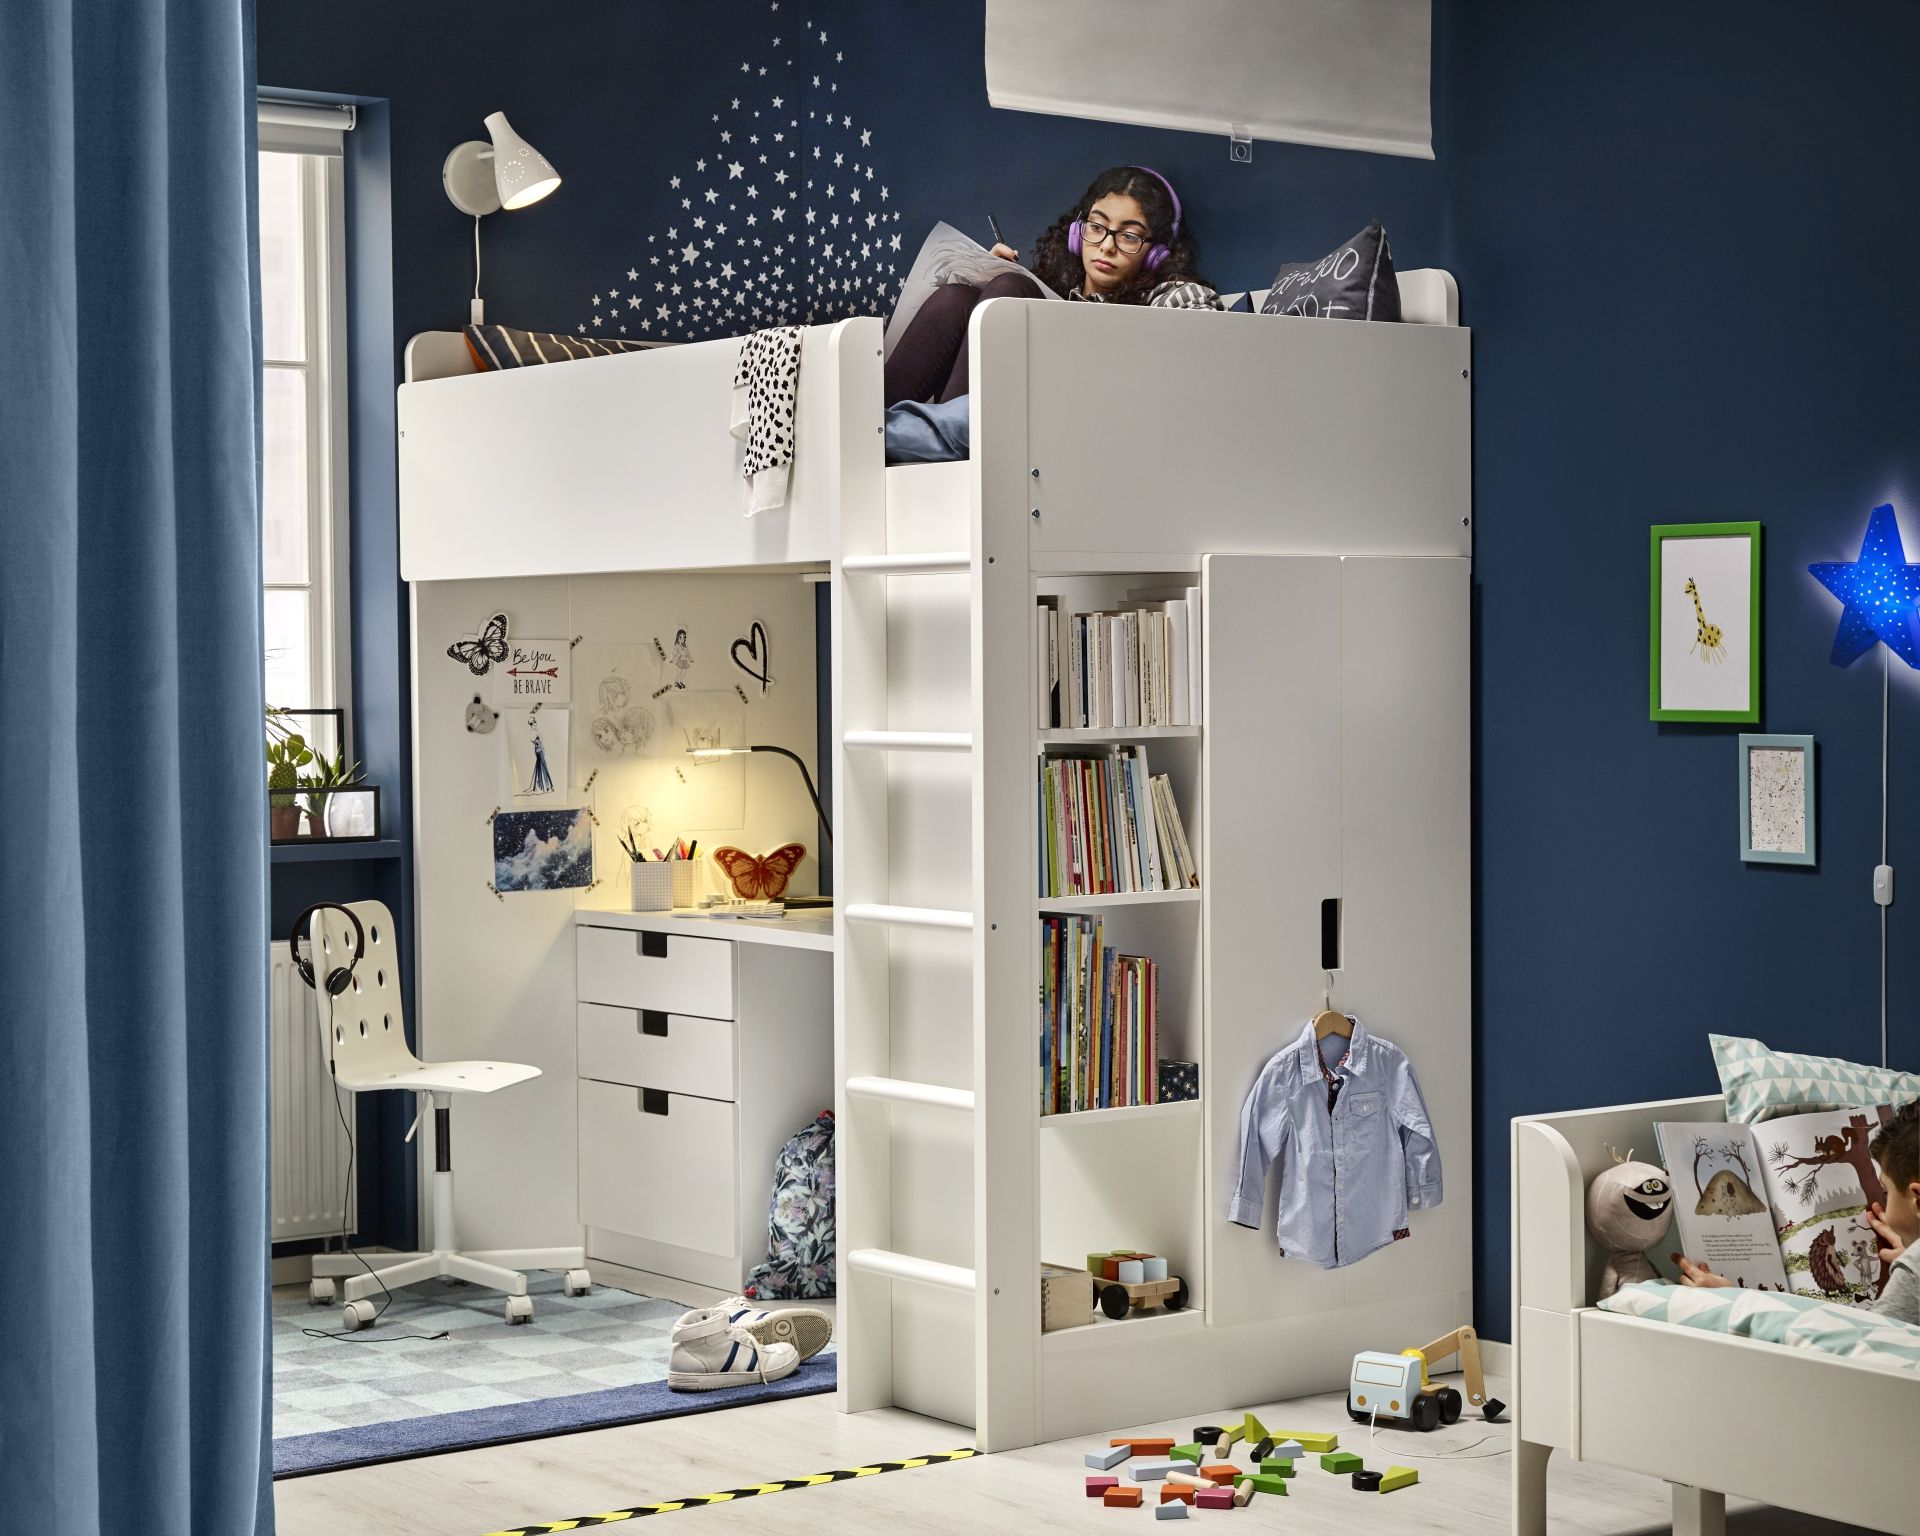 Stuva Hoogslaper Ikeacatalogus Nieuw 2018 Ikea Ikeanl